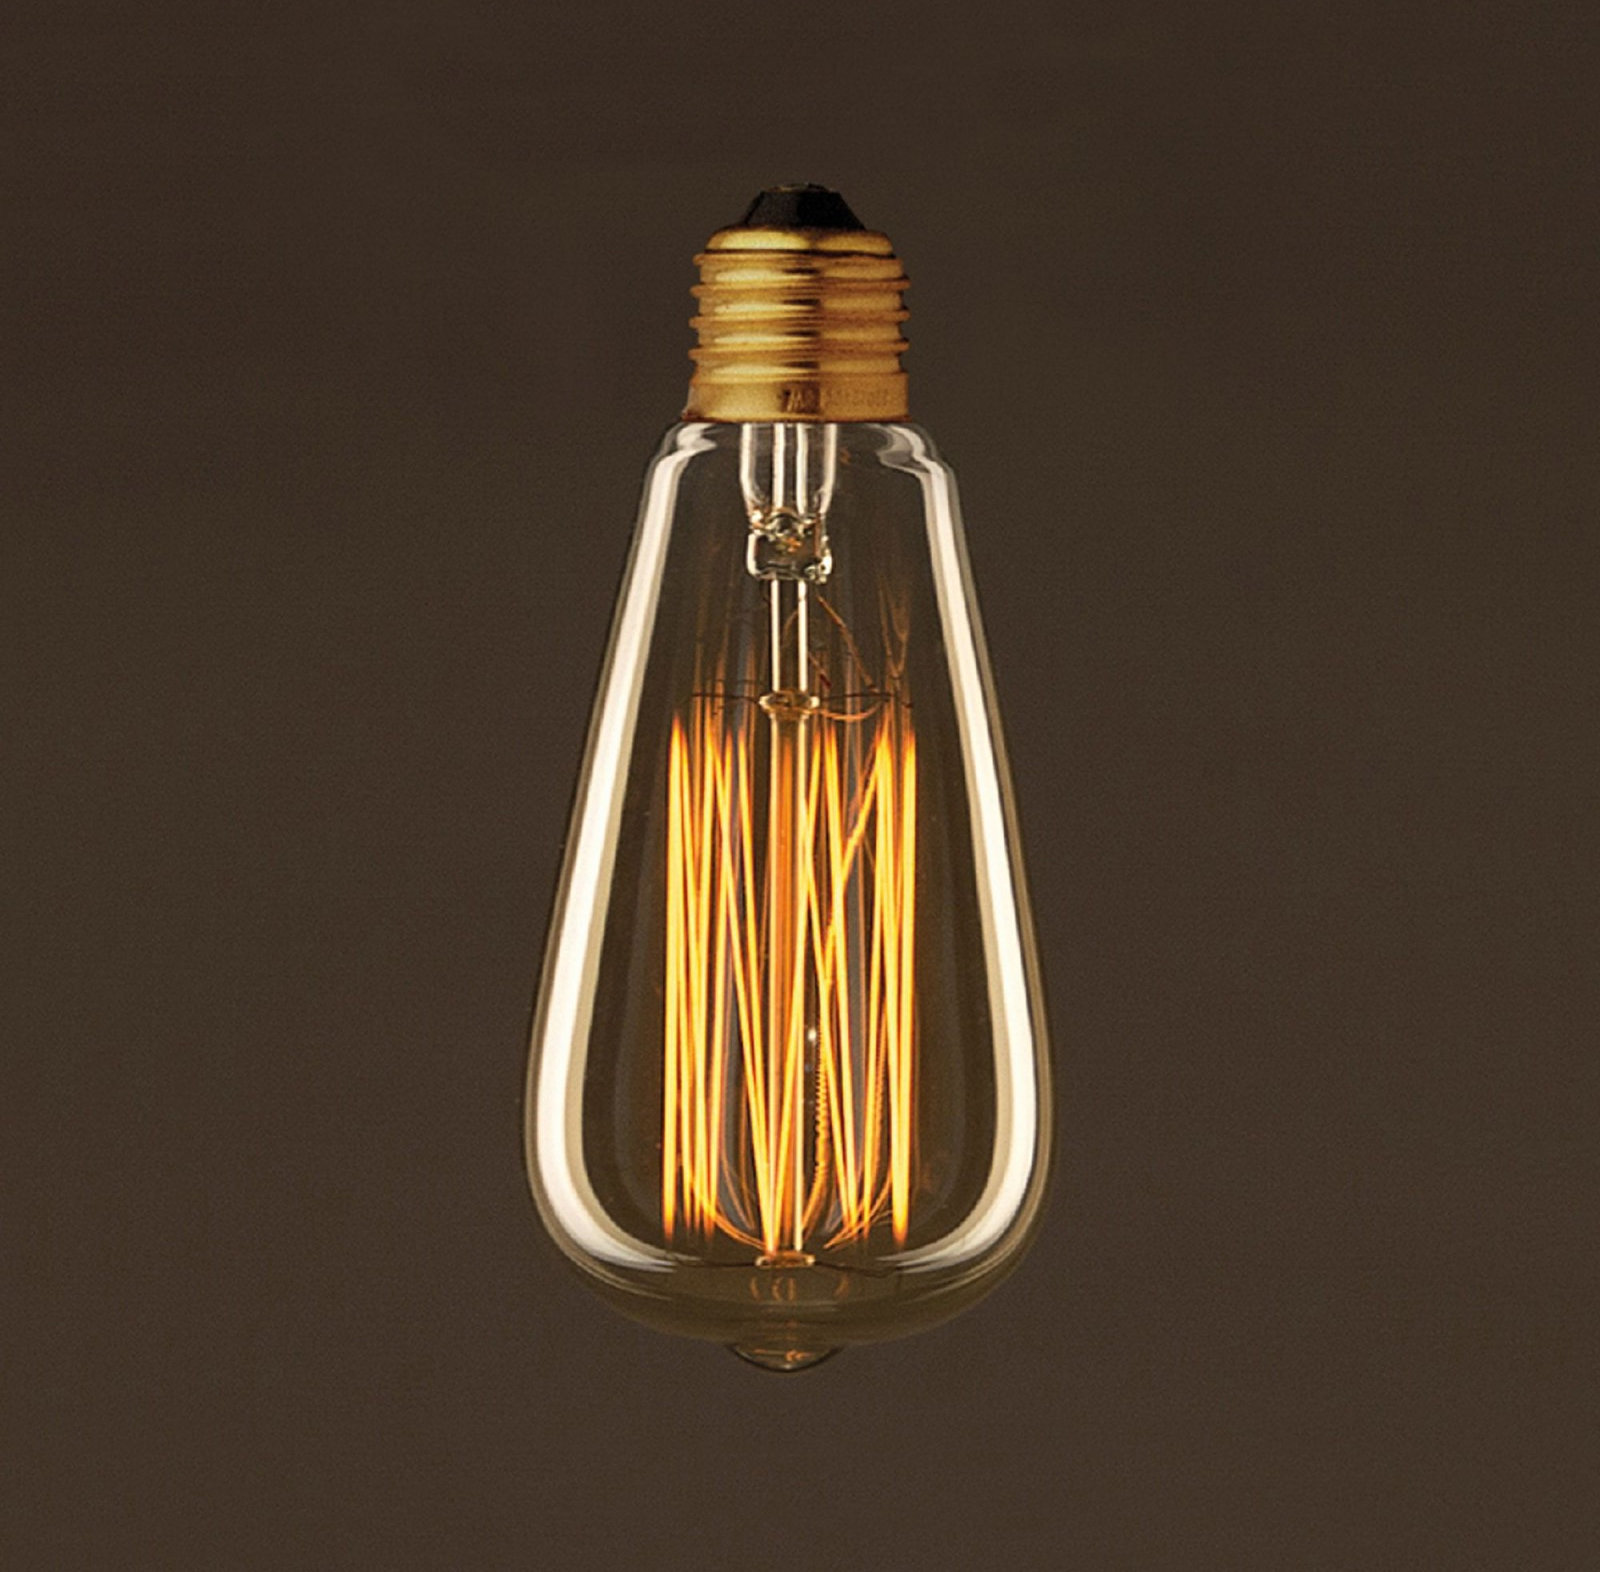 EDISON žiarovka - TEARDROP - E27, 30W, 60lm (2)